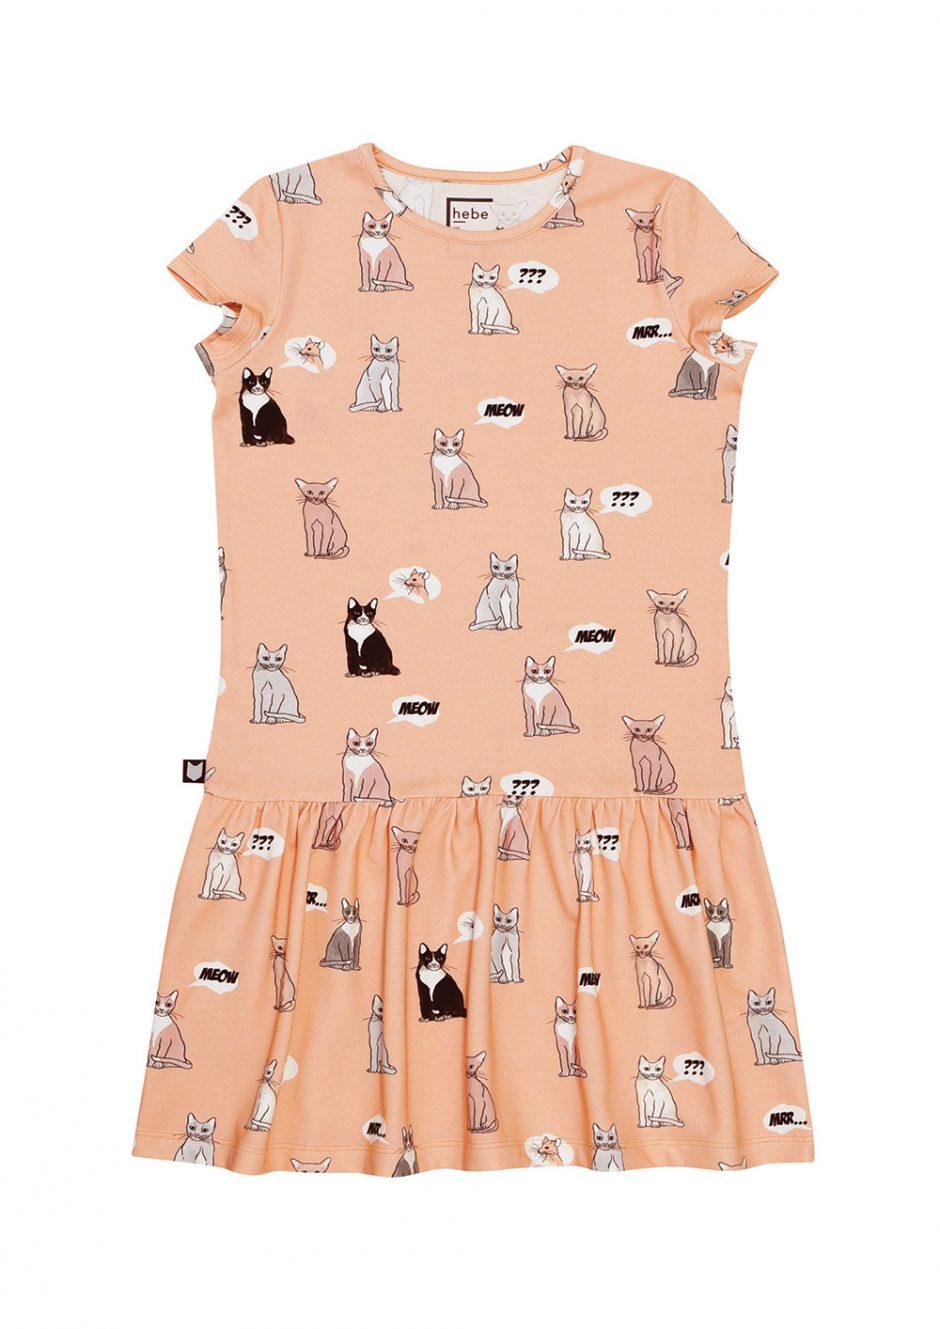 Hebe cat dress